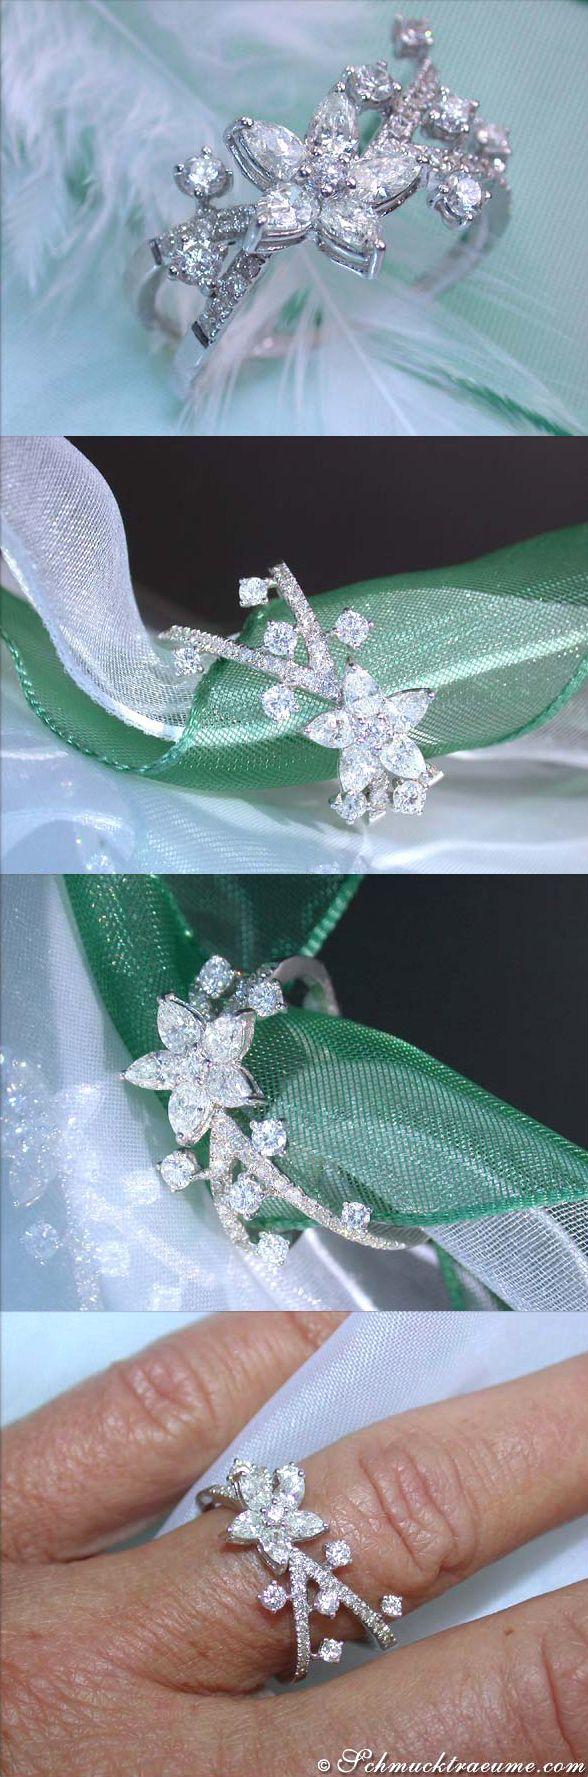 Beautiful Diamond Blossom Ring, 1,32 ct. (G-VS) WG18K - Visit: schmucktraeume.com Like: https://www.facebook.com/pages/Noble-Juwelen/150871984924926 Mail: info@schmucktraeume.com